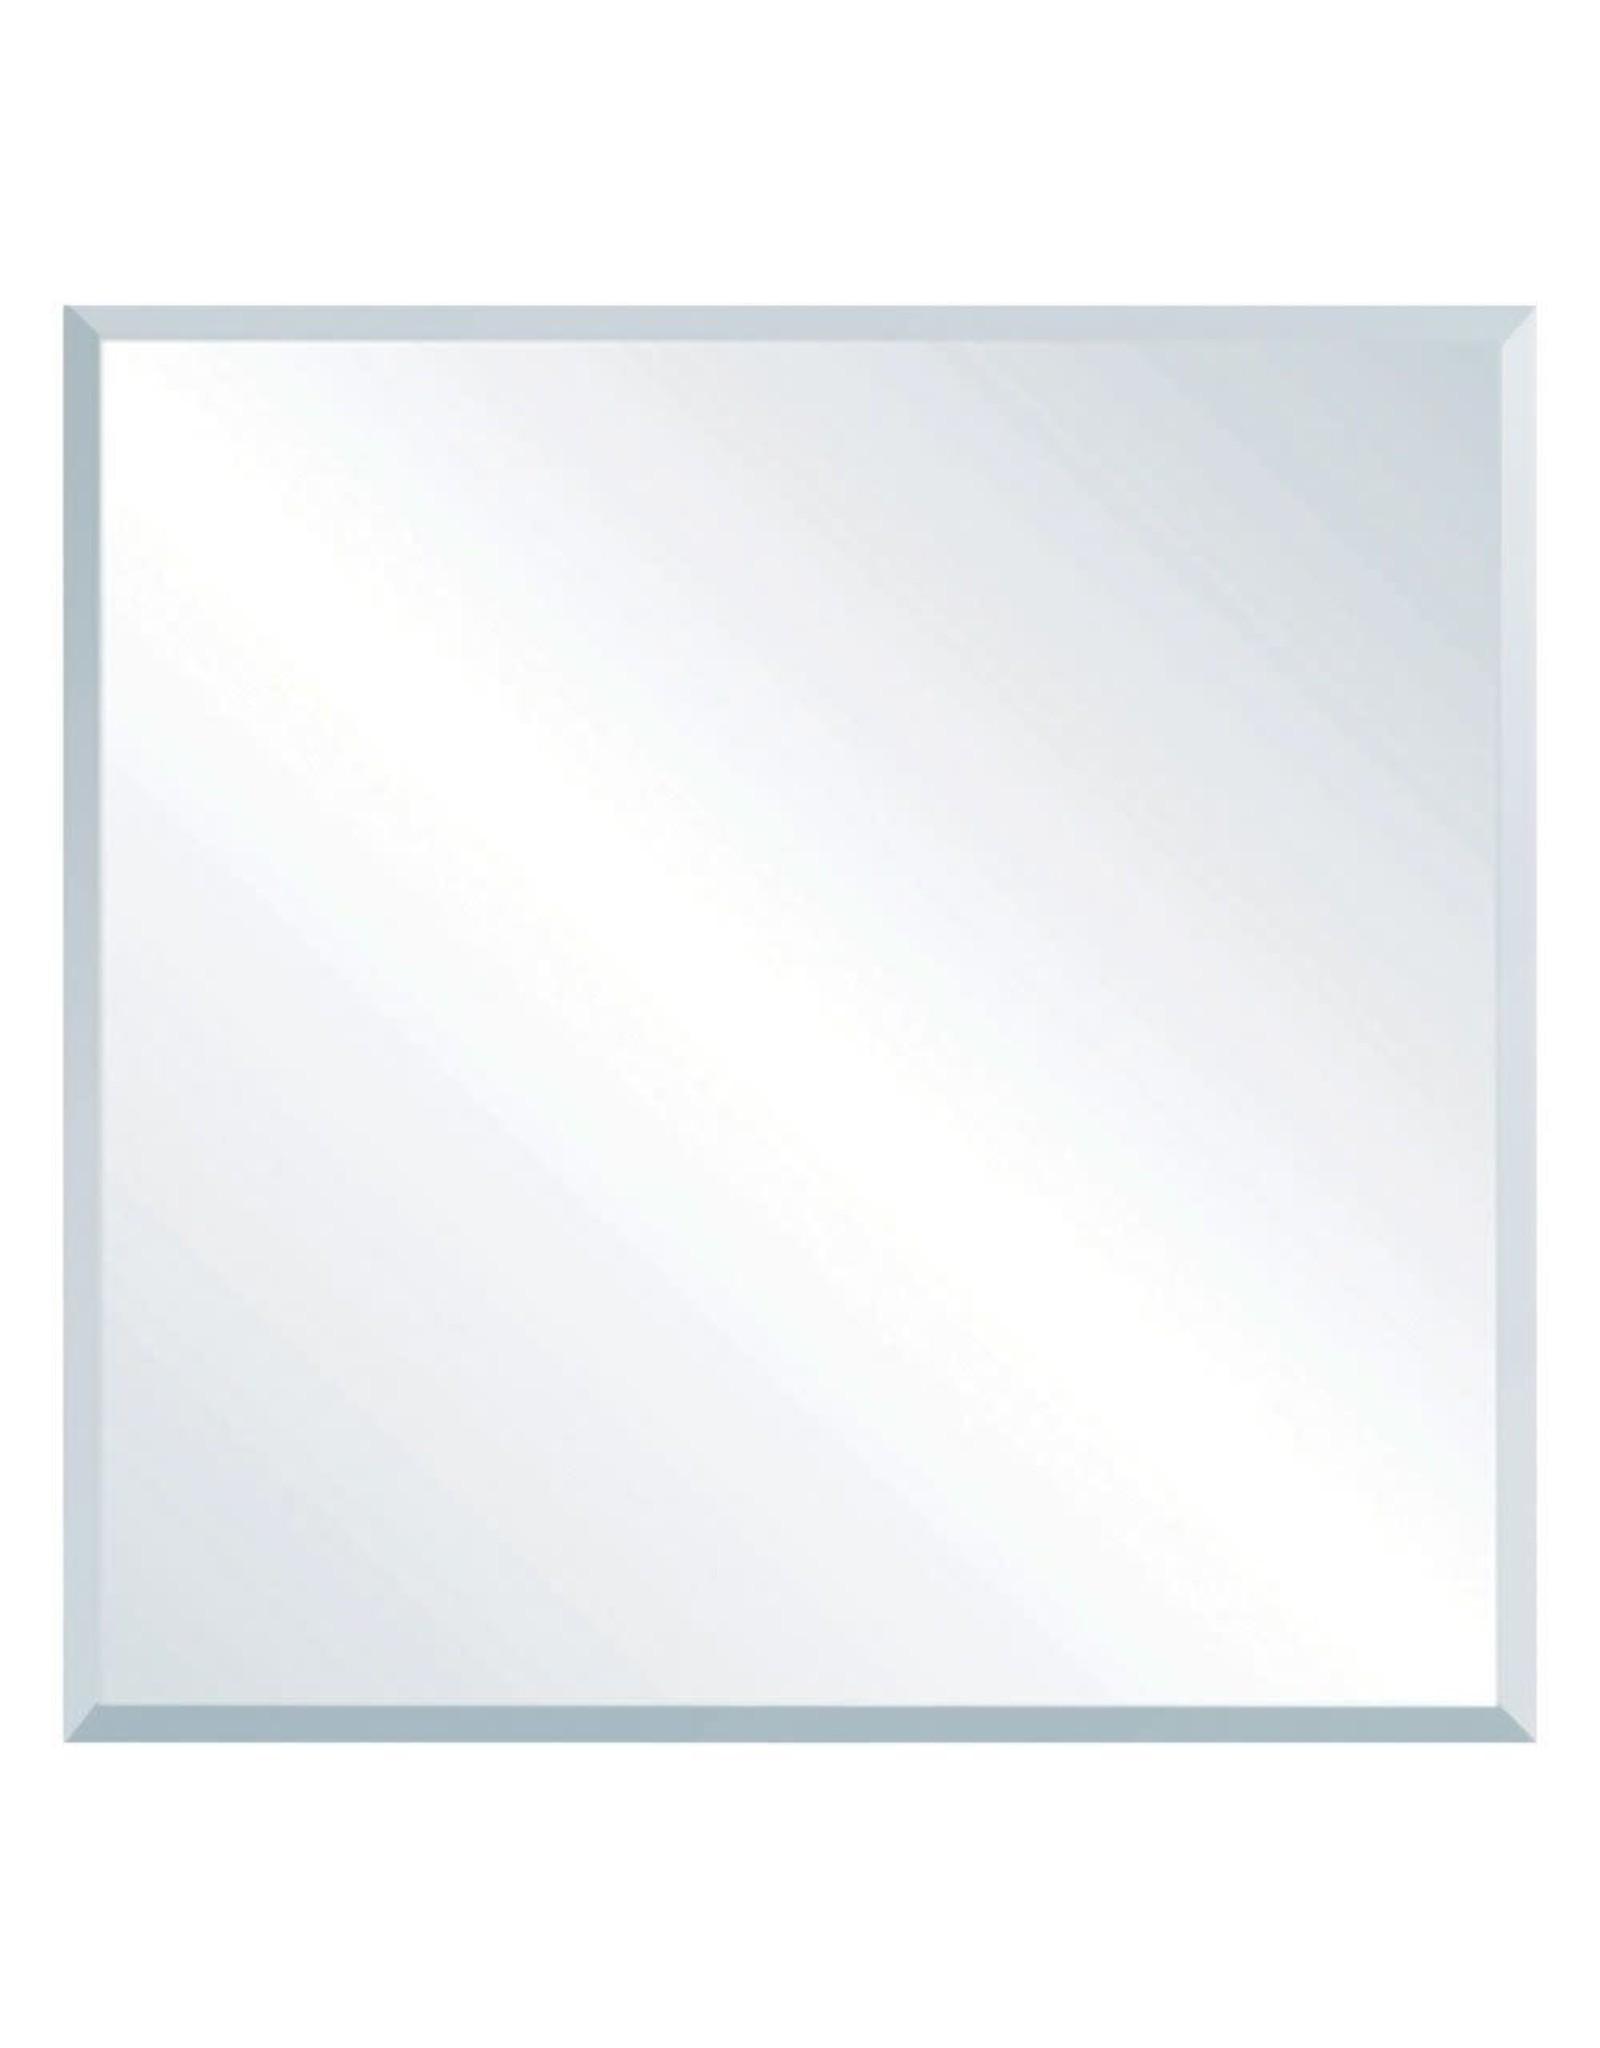 FIENZA 450x600, FIENZA, bevel edge mirror